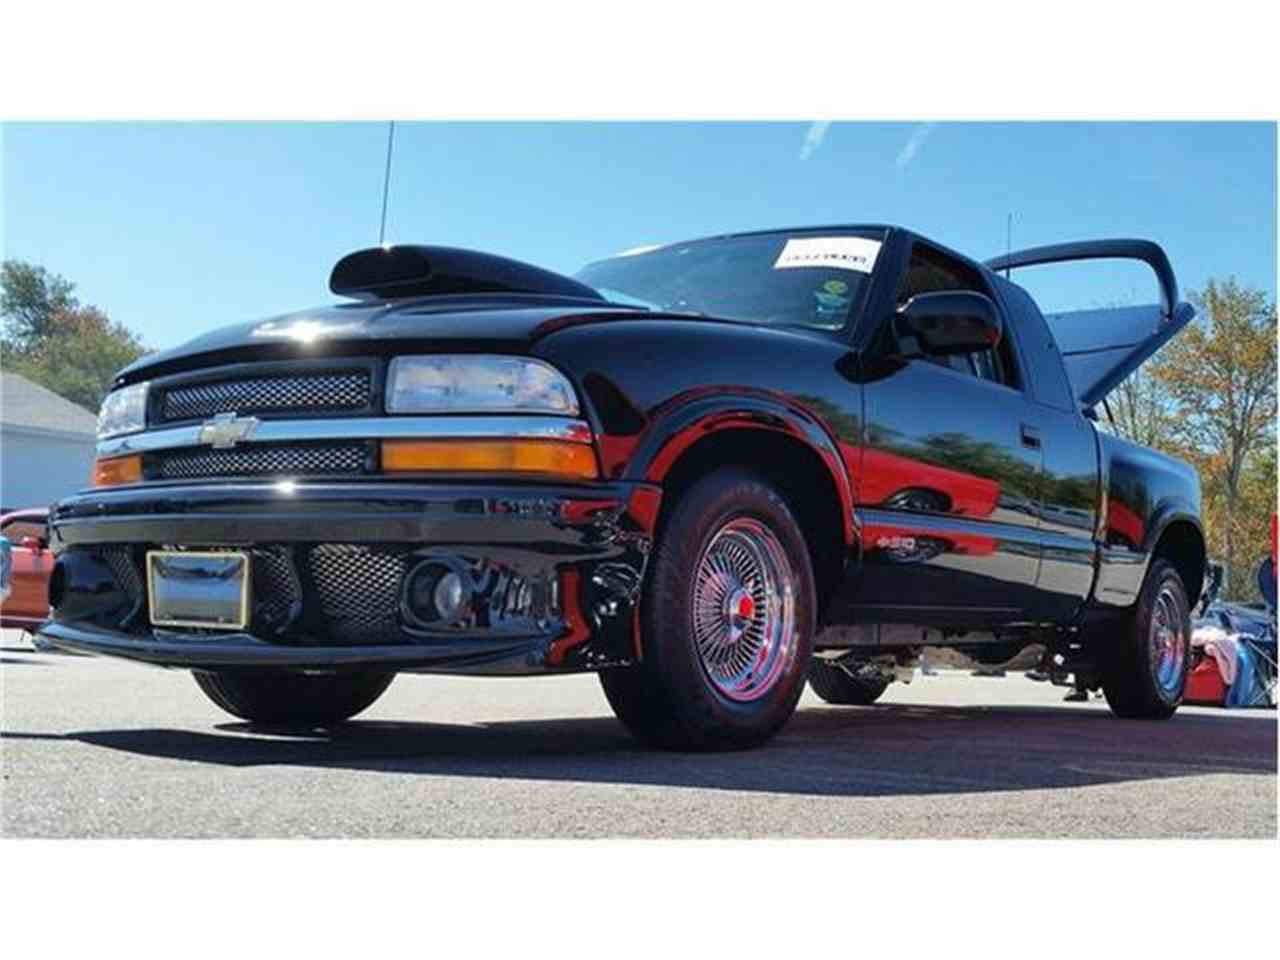 1998 Chevrolet S10 for Sale | ClassicCars.com | CC-937999